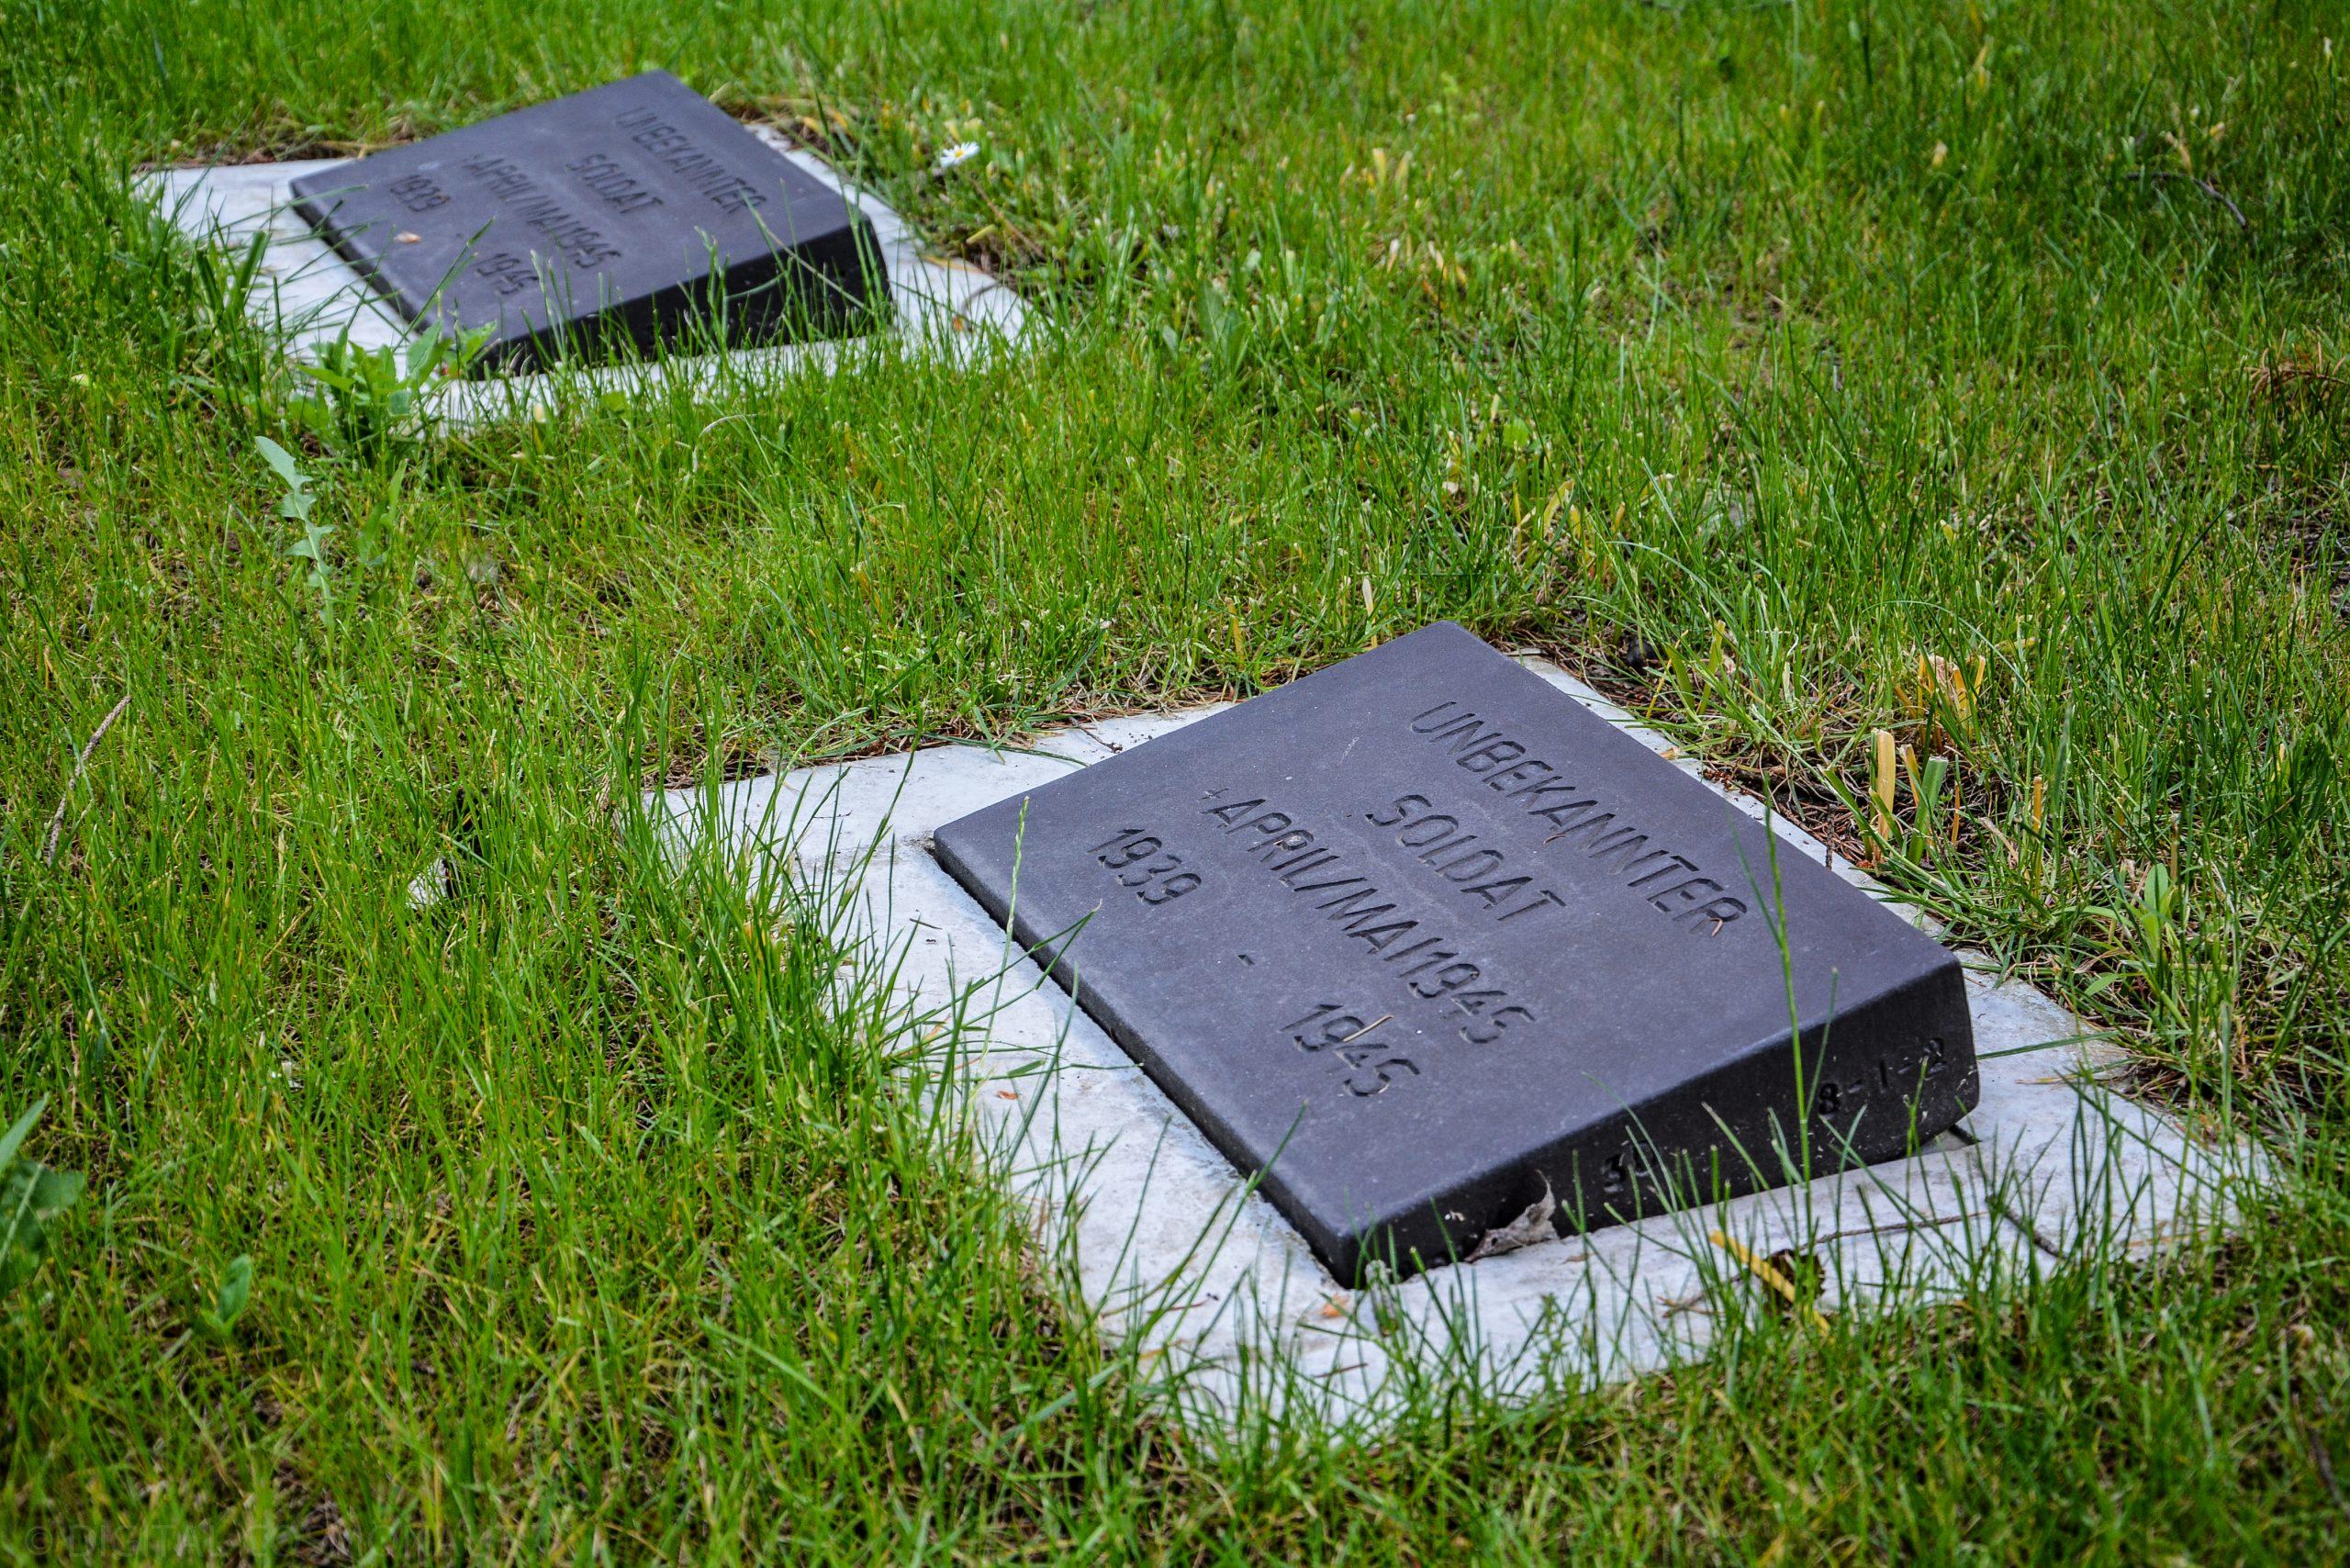 kriegsgrab domfriedhof berlin kuppelkreuz berliner dom berlin cathedral church cross st hedwig friedhof cemetery domfriedhof